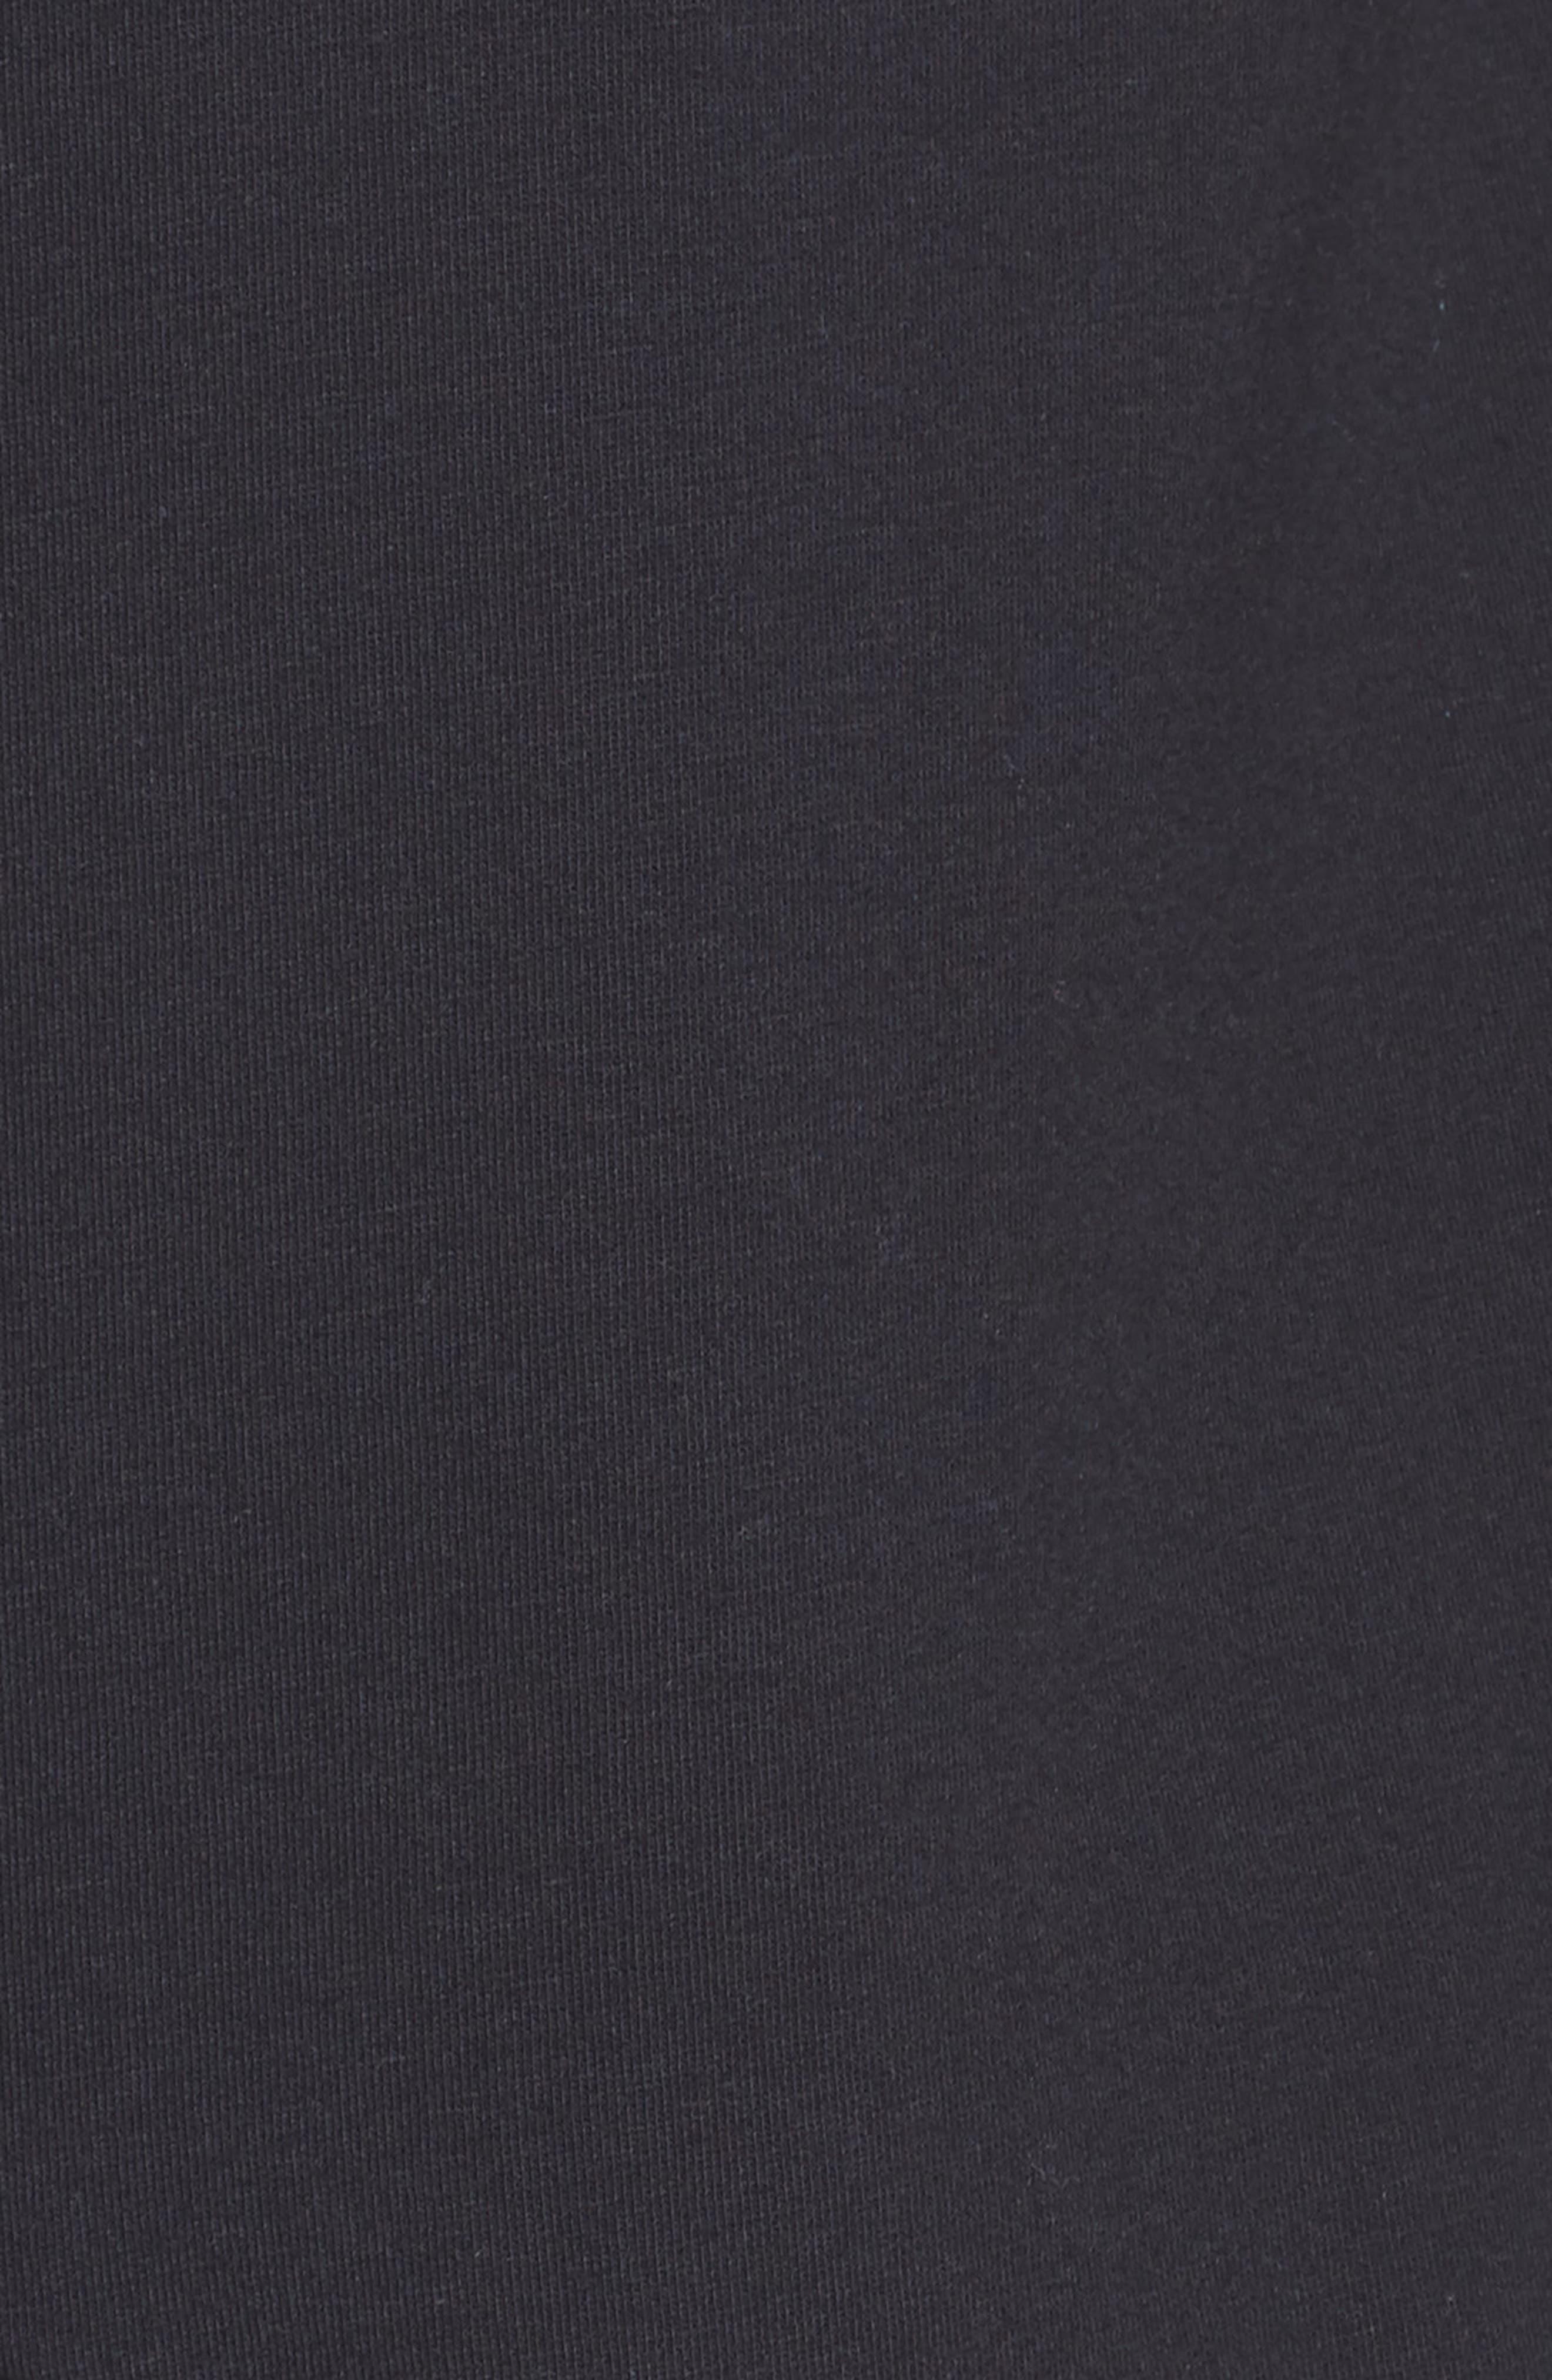 ZELLA, Ria Hooded Cardigan, Alternate thumbnail 6, color, BLACK FLEECE